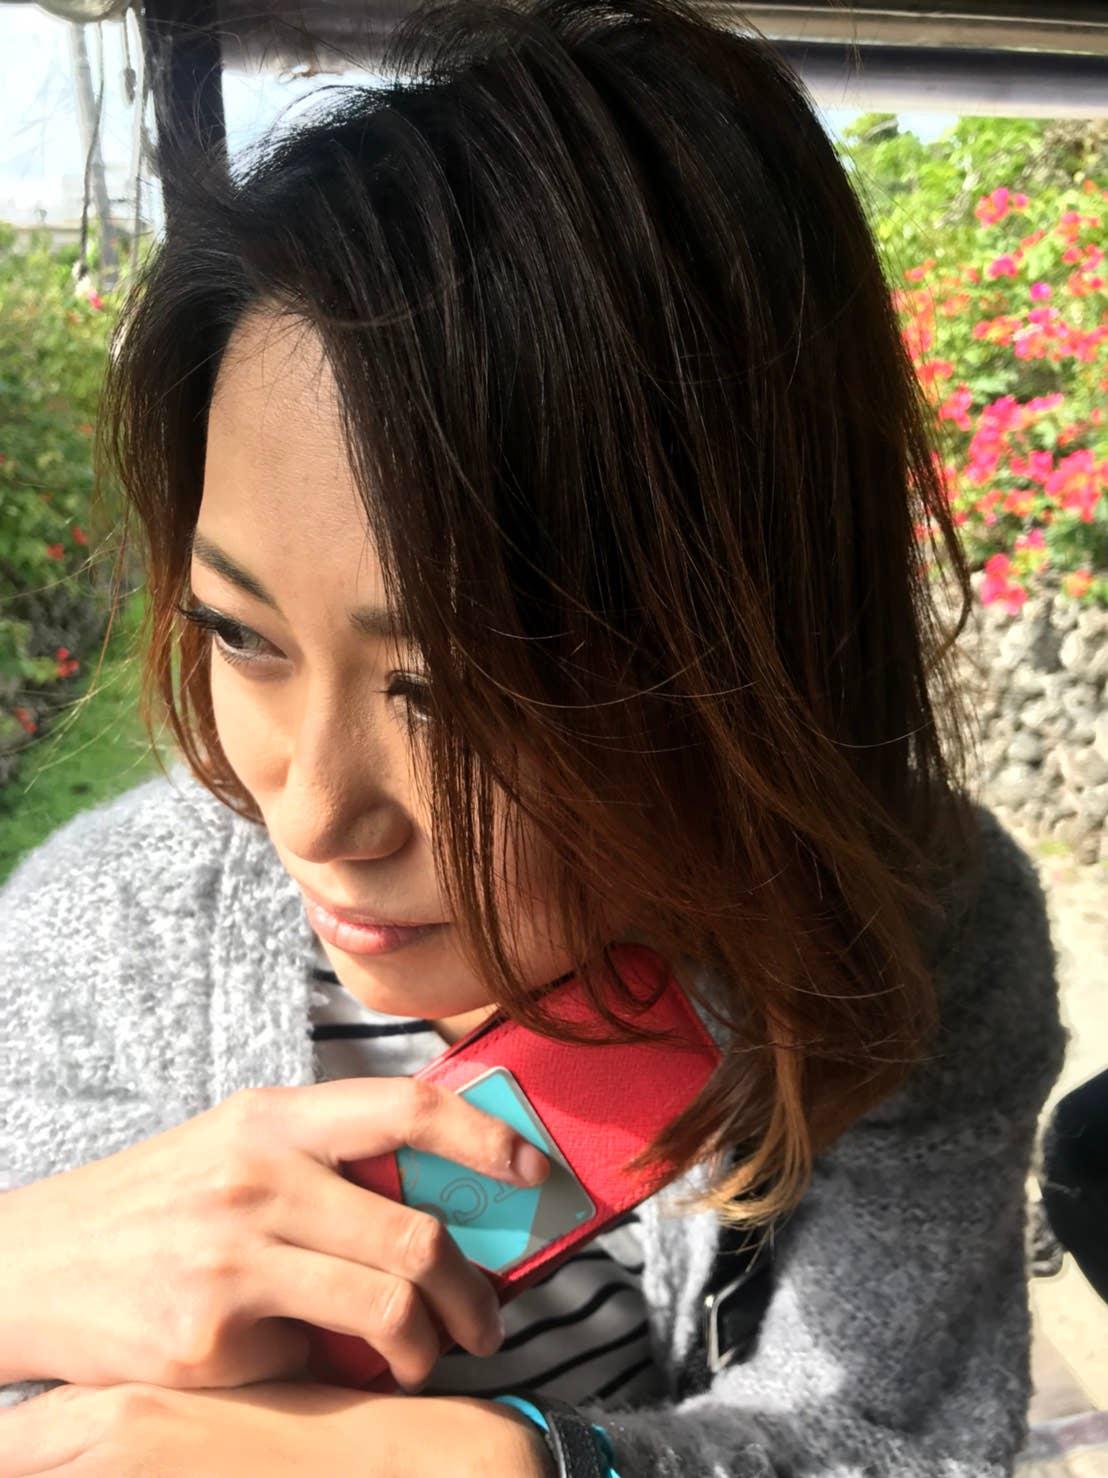 M_Tanaka